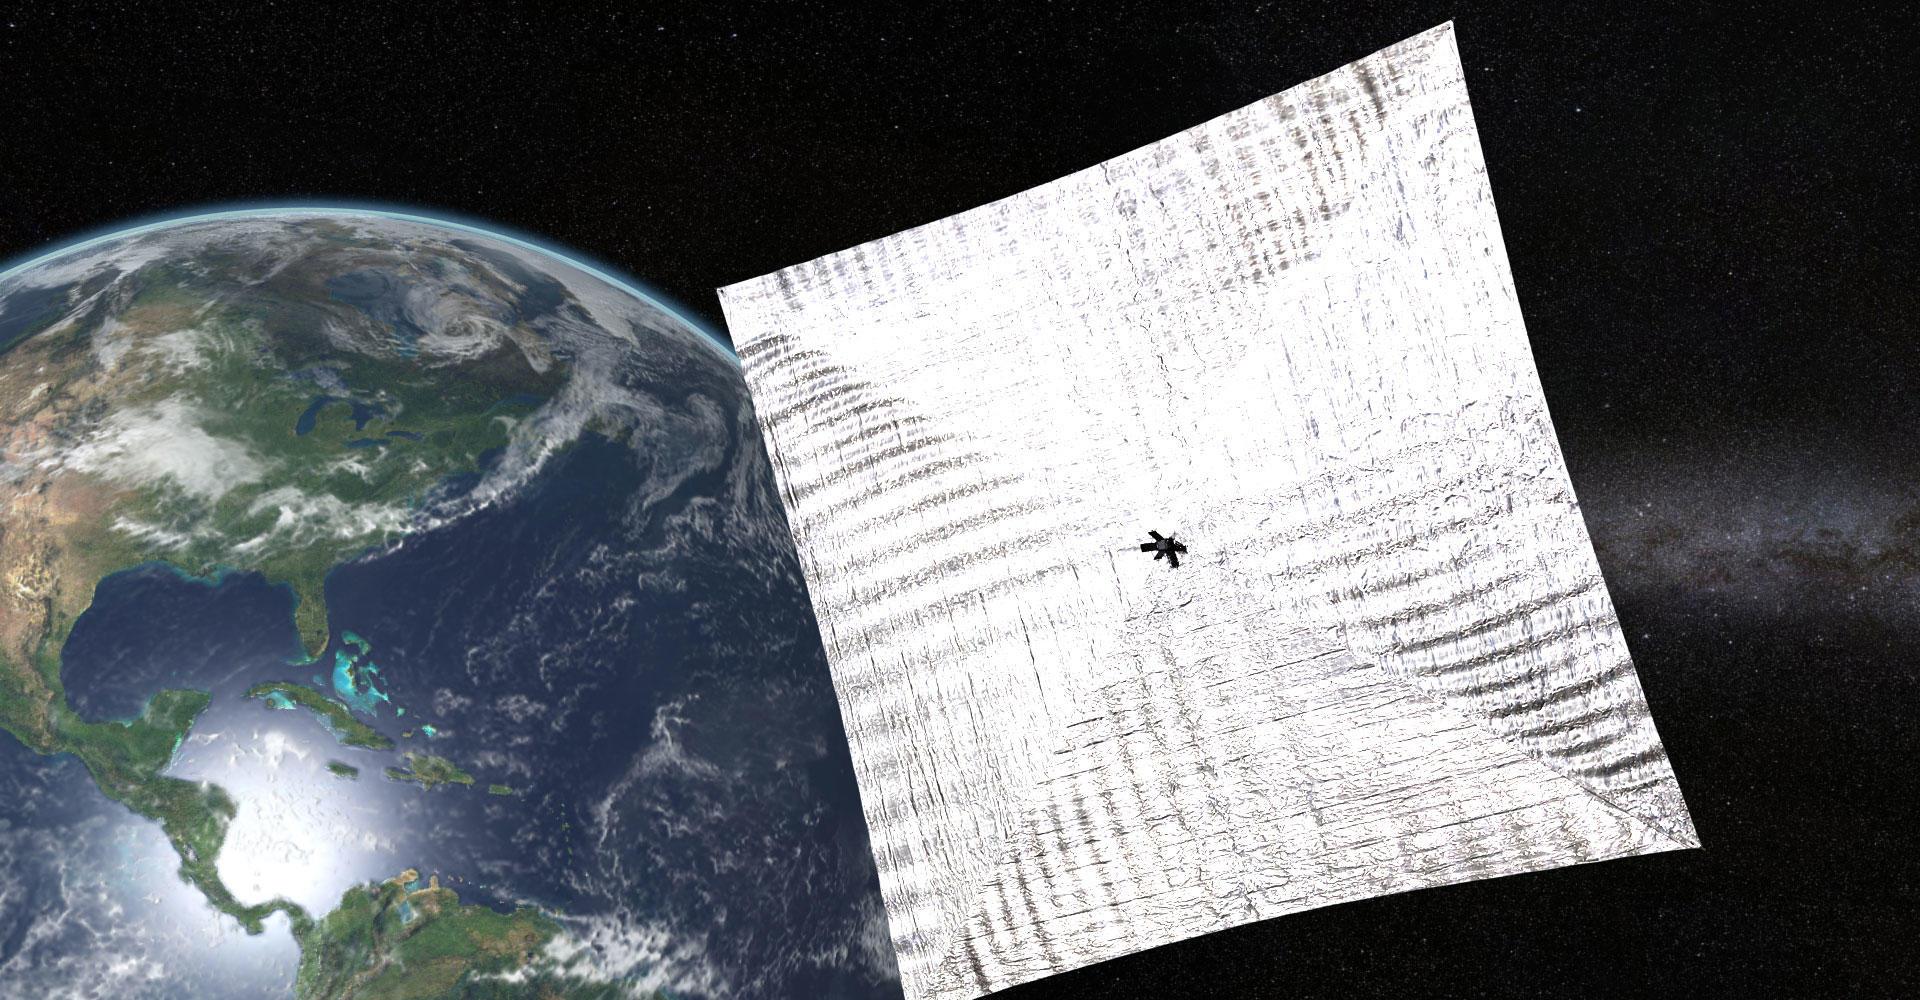 LightSail in Earth orbit